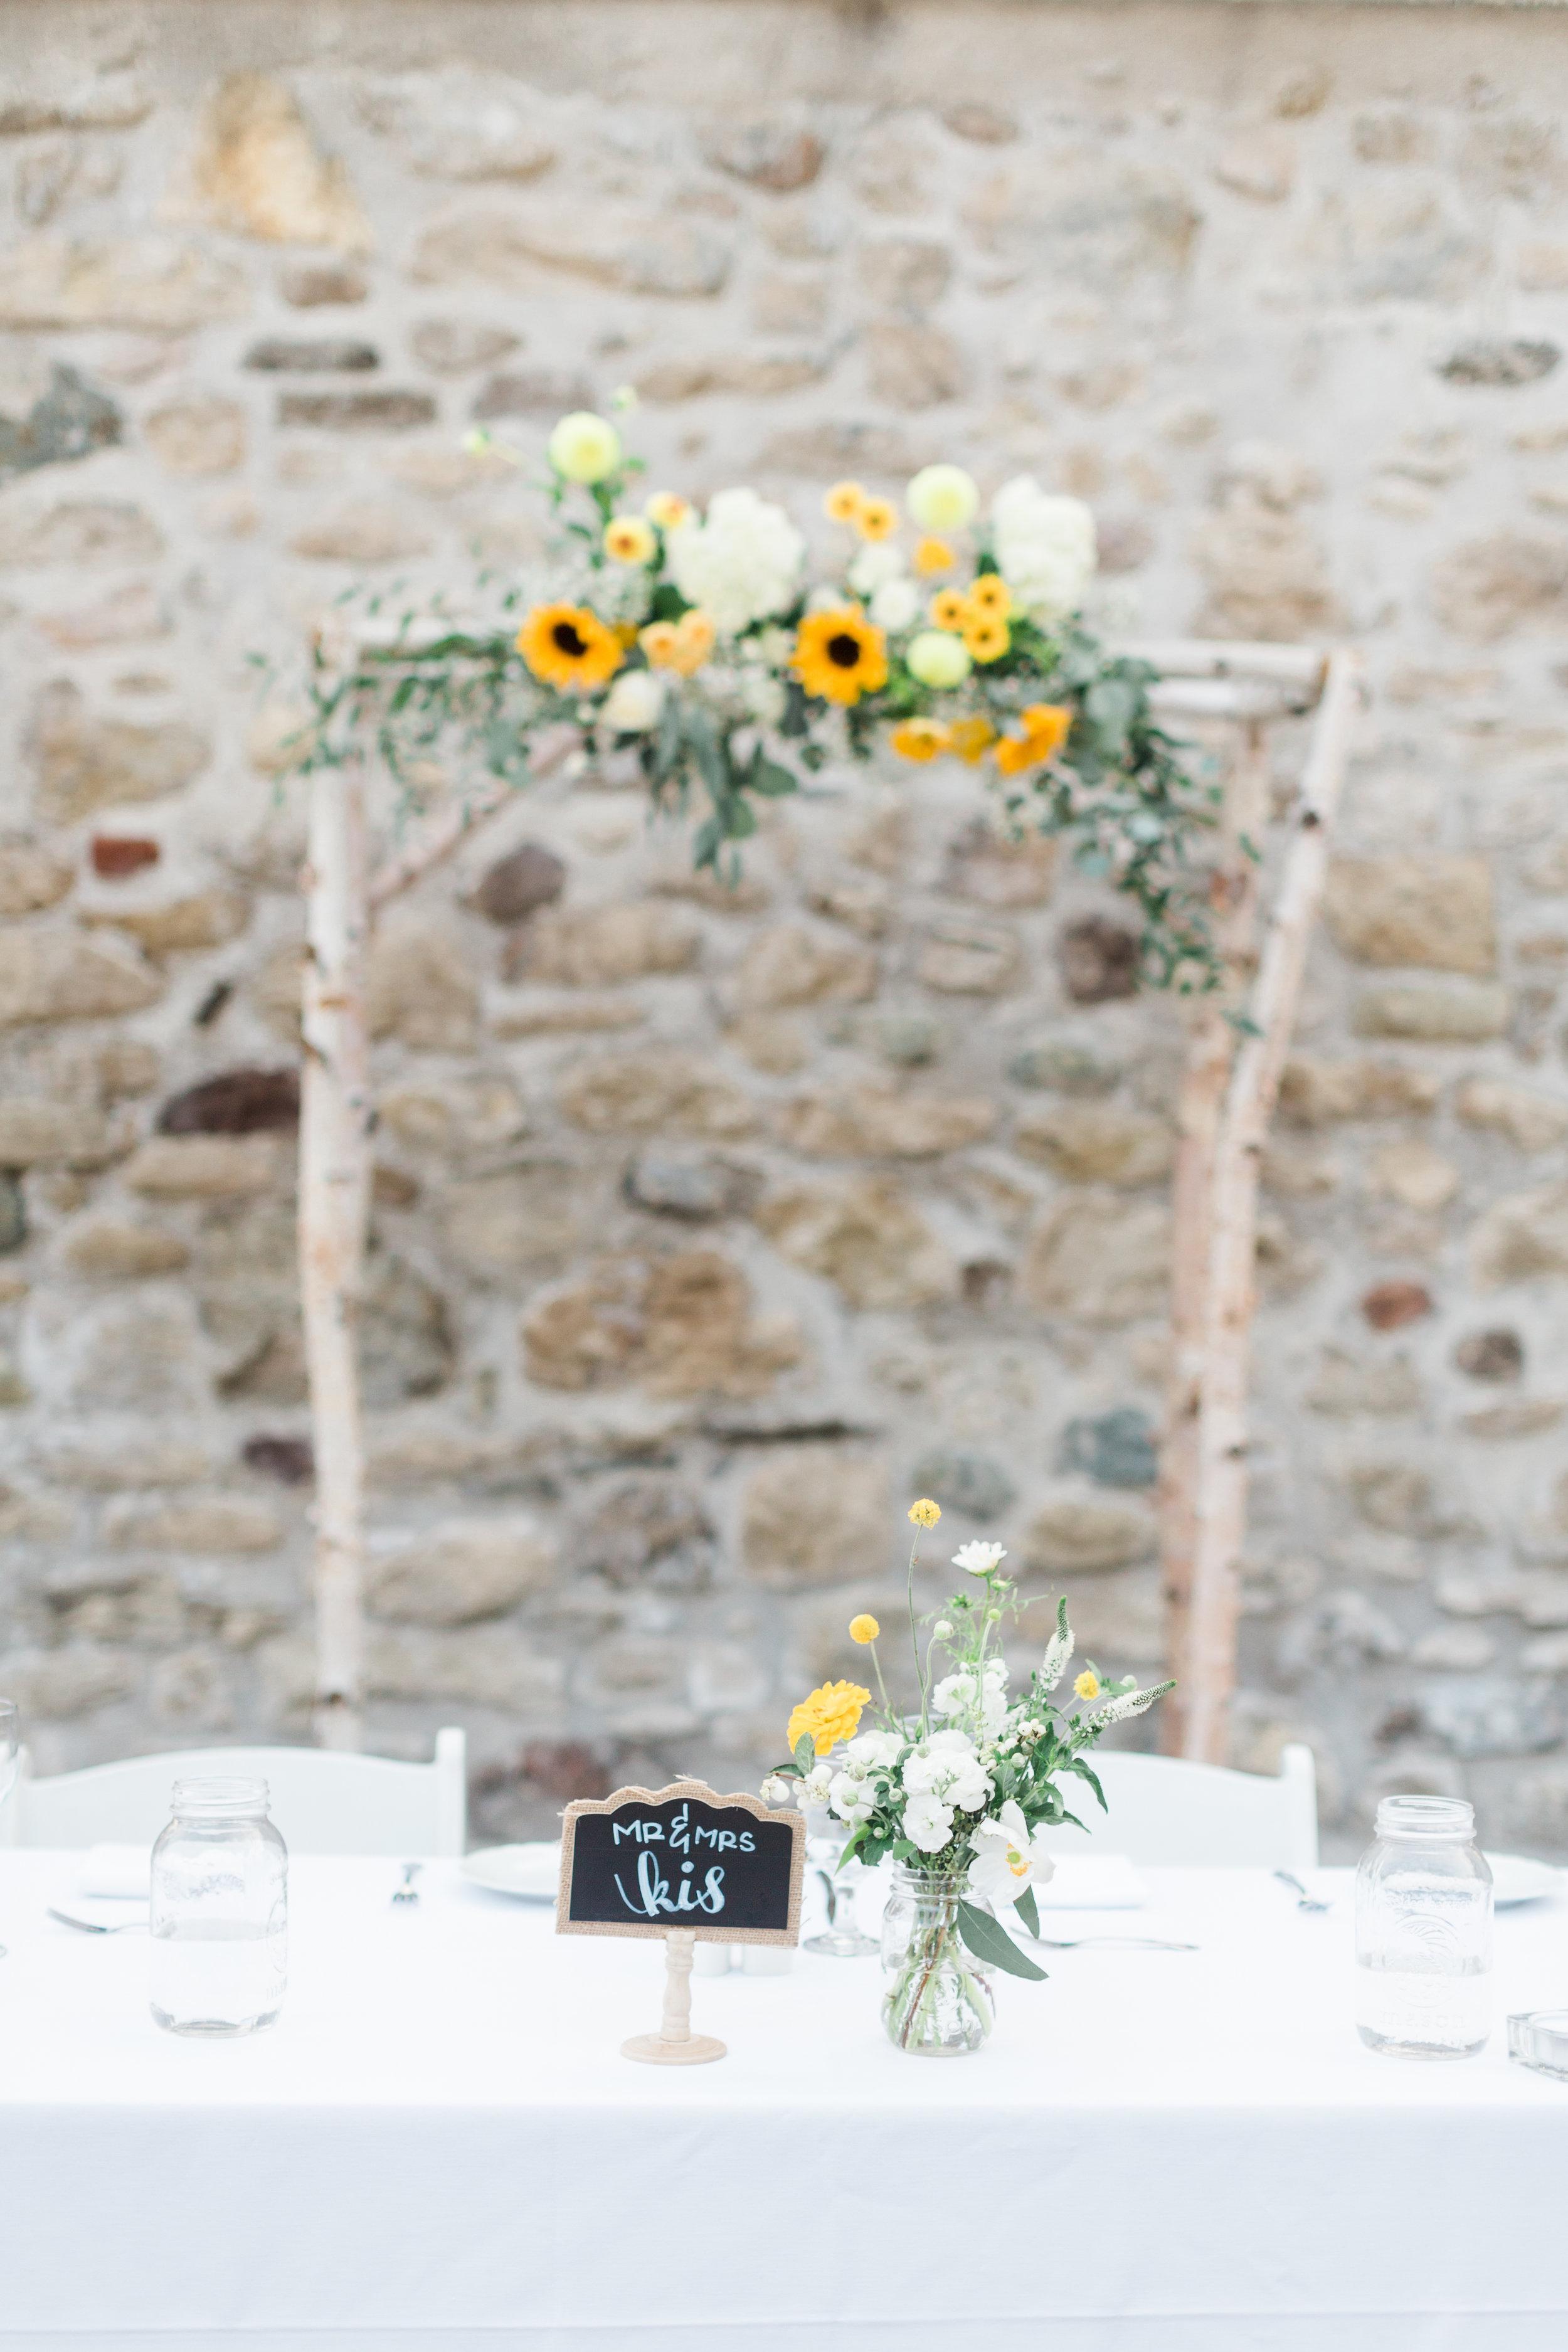 Alton Mills Wedding - Reception-3.jpg